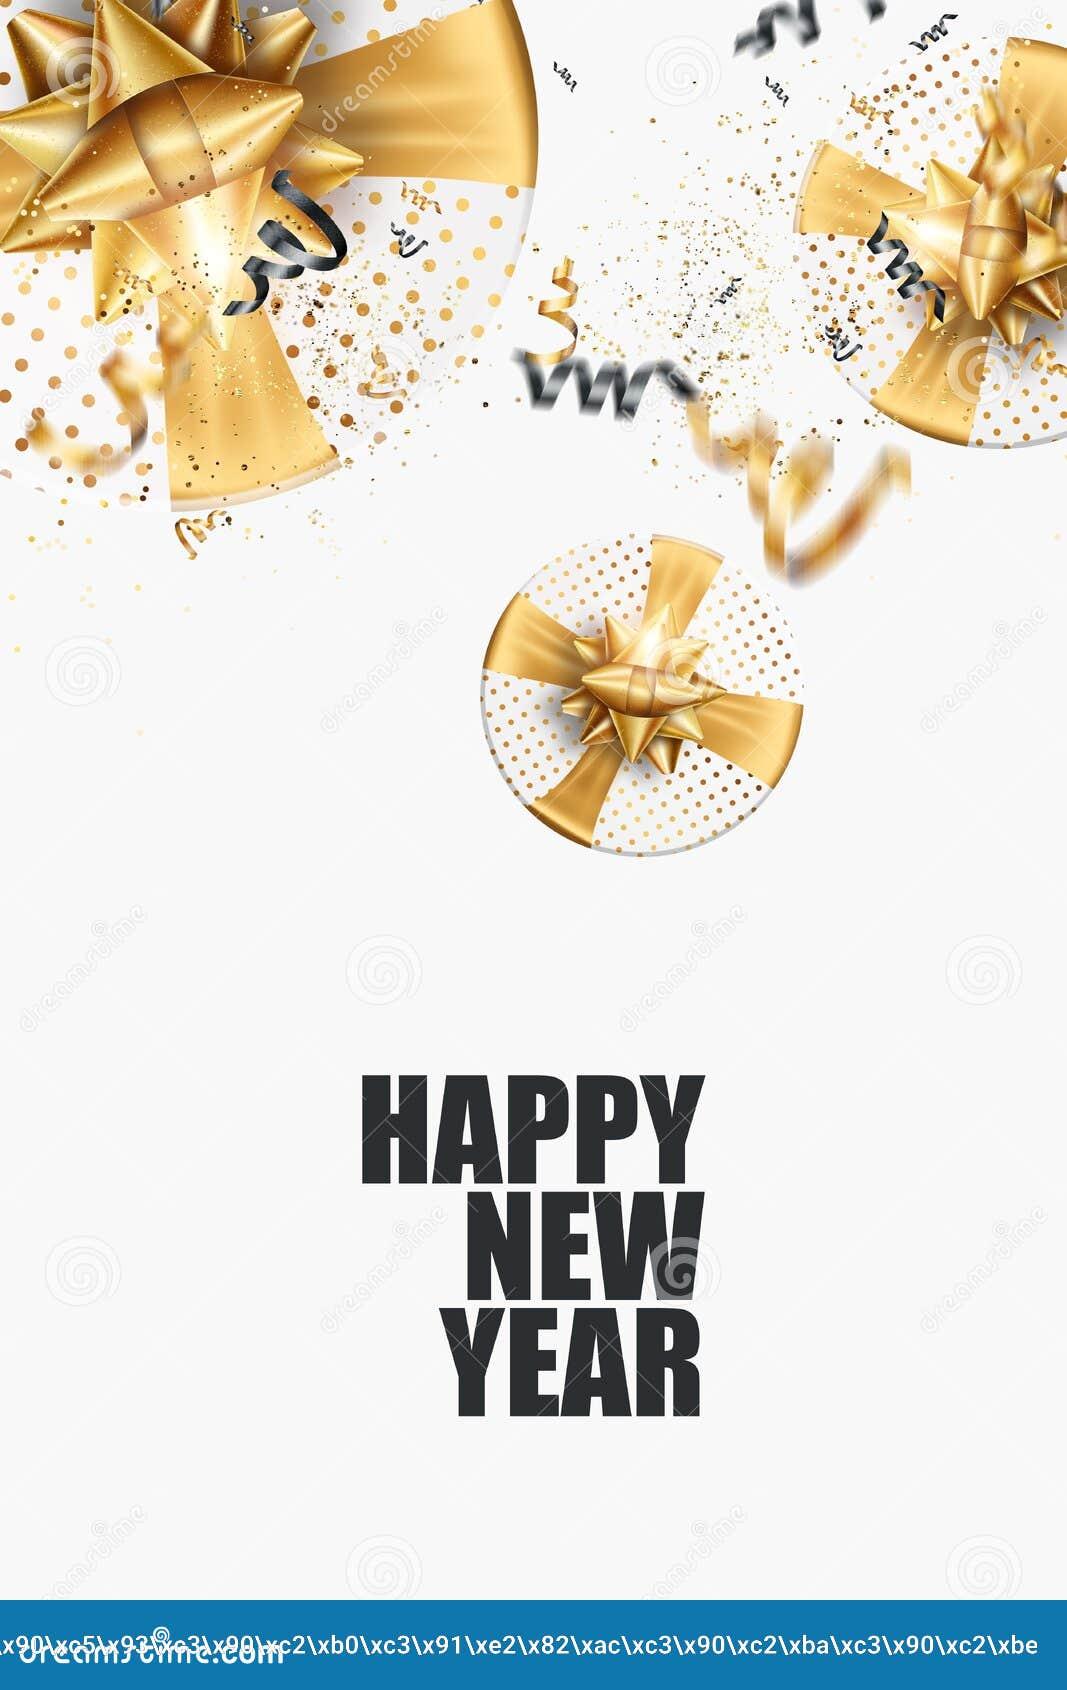 flyer a4 happy new year 2020 on a white background black gold design brochure design template card banner 3d illustration 3d stock illustration illustration of cover golden 166298032 dreamstime com